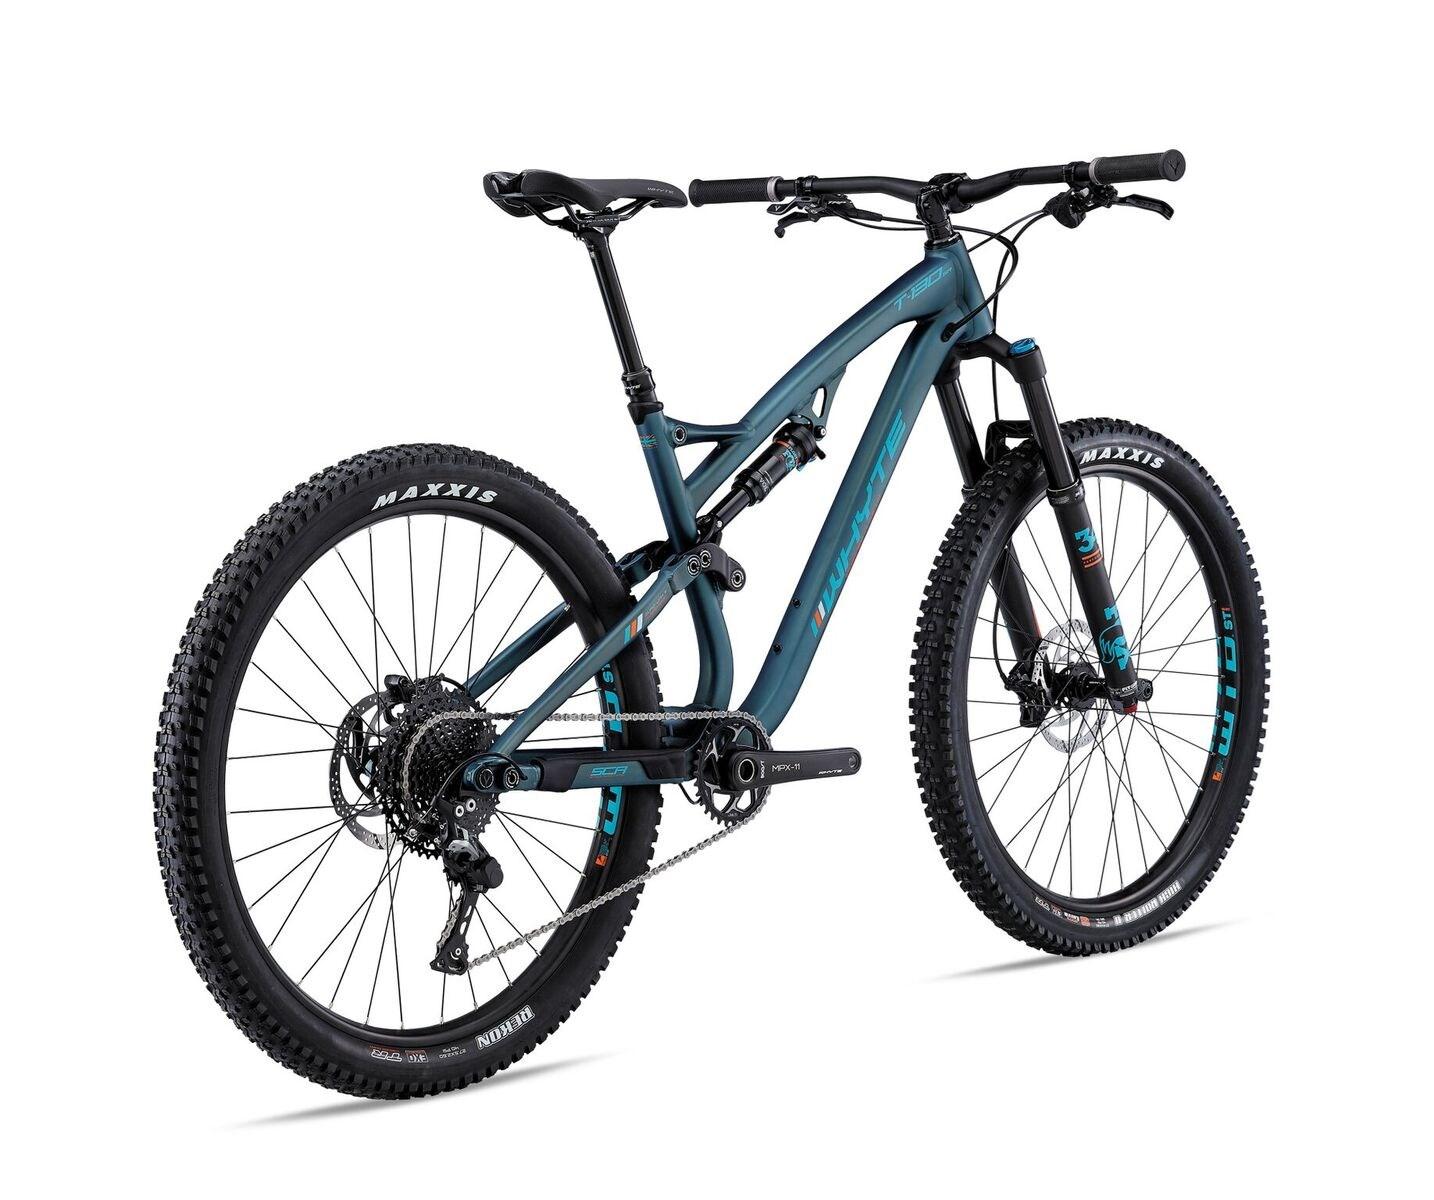 Fair Trading Licence Check >> 2019 Whyte 130 SR 27.5 inch Full Suspension Mountain Bike £2,250.00